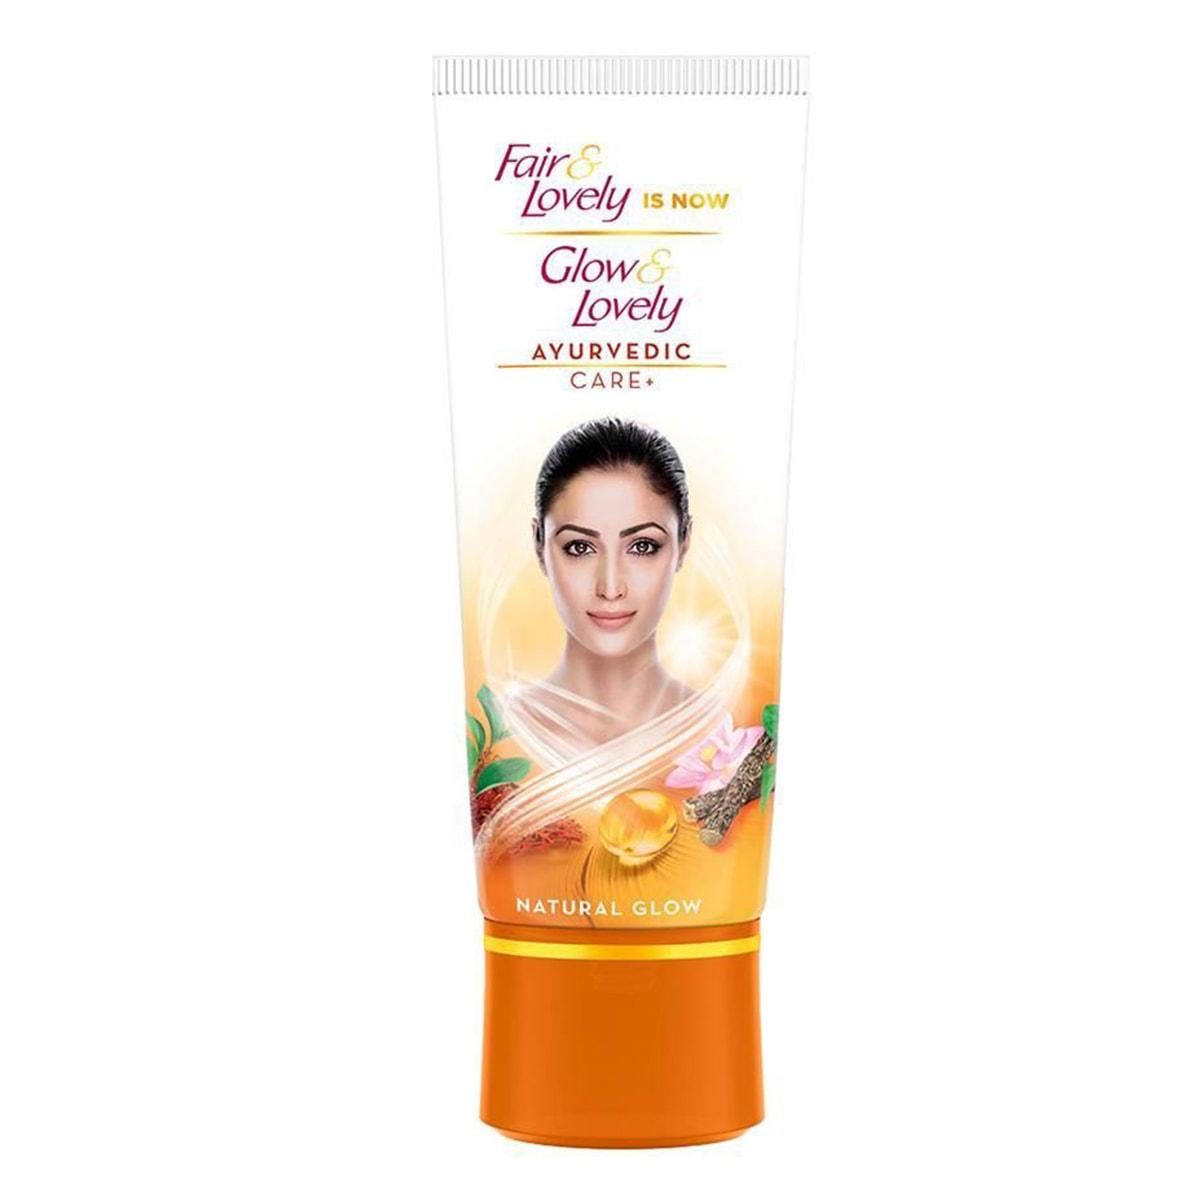 Buy Glow and Lovely Ayurvedic Care Cream - 50 gm